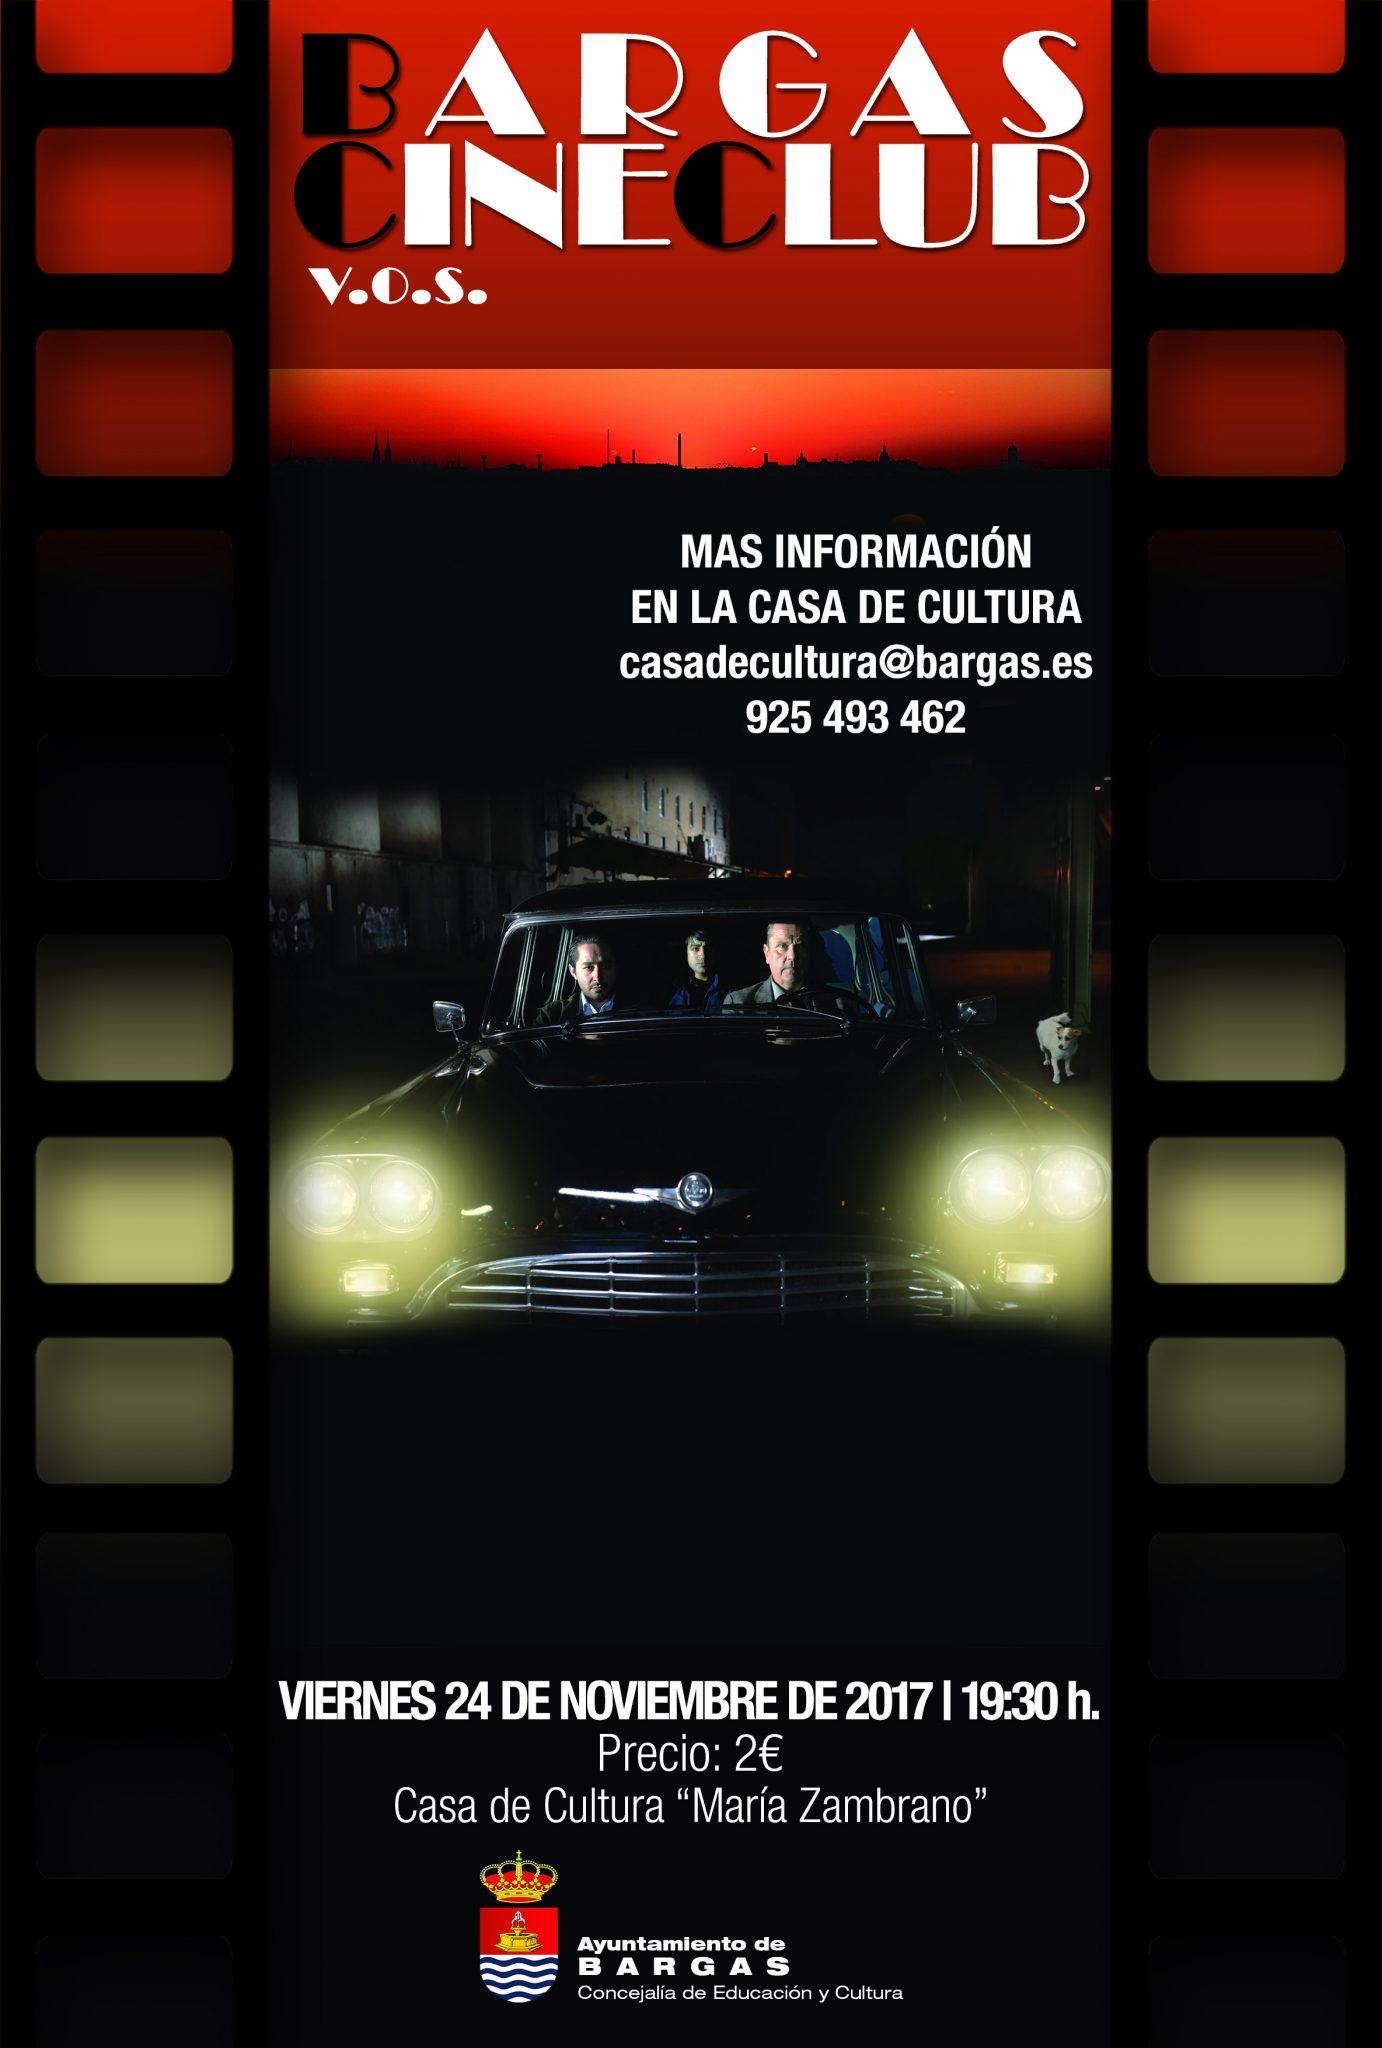 Cineclub V.O.S. Noviembre